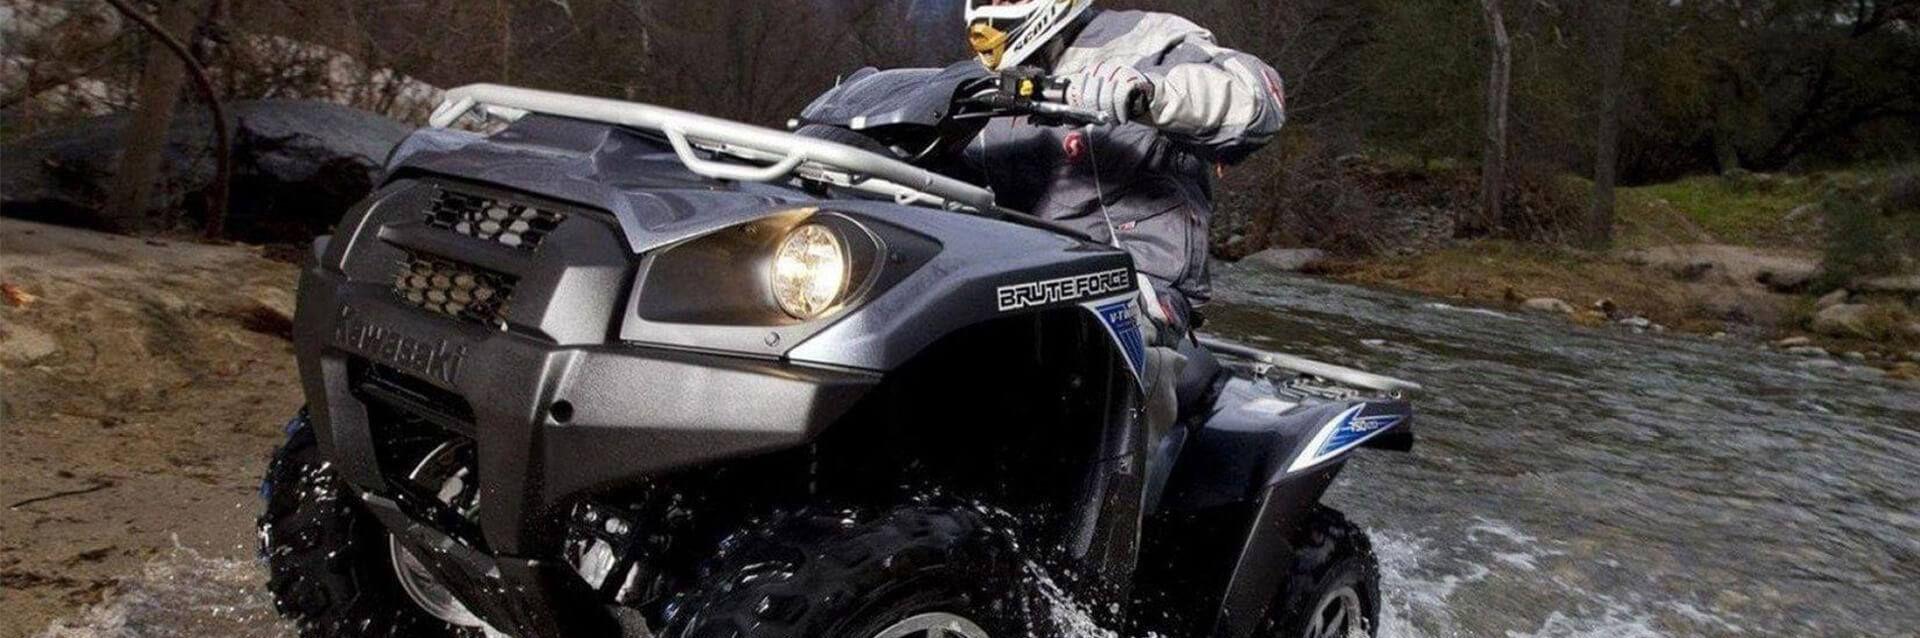 Kawasaki - Suzuki - Yamaha of Hickory is located in Hickory